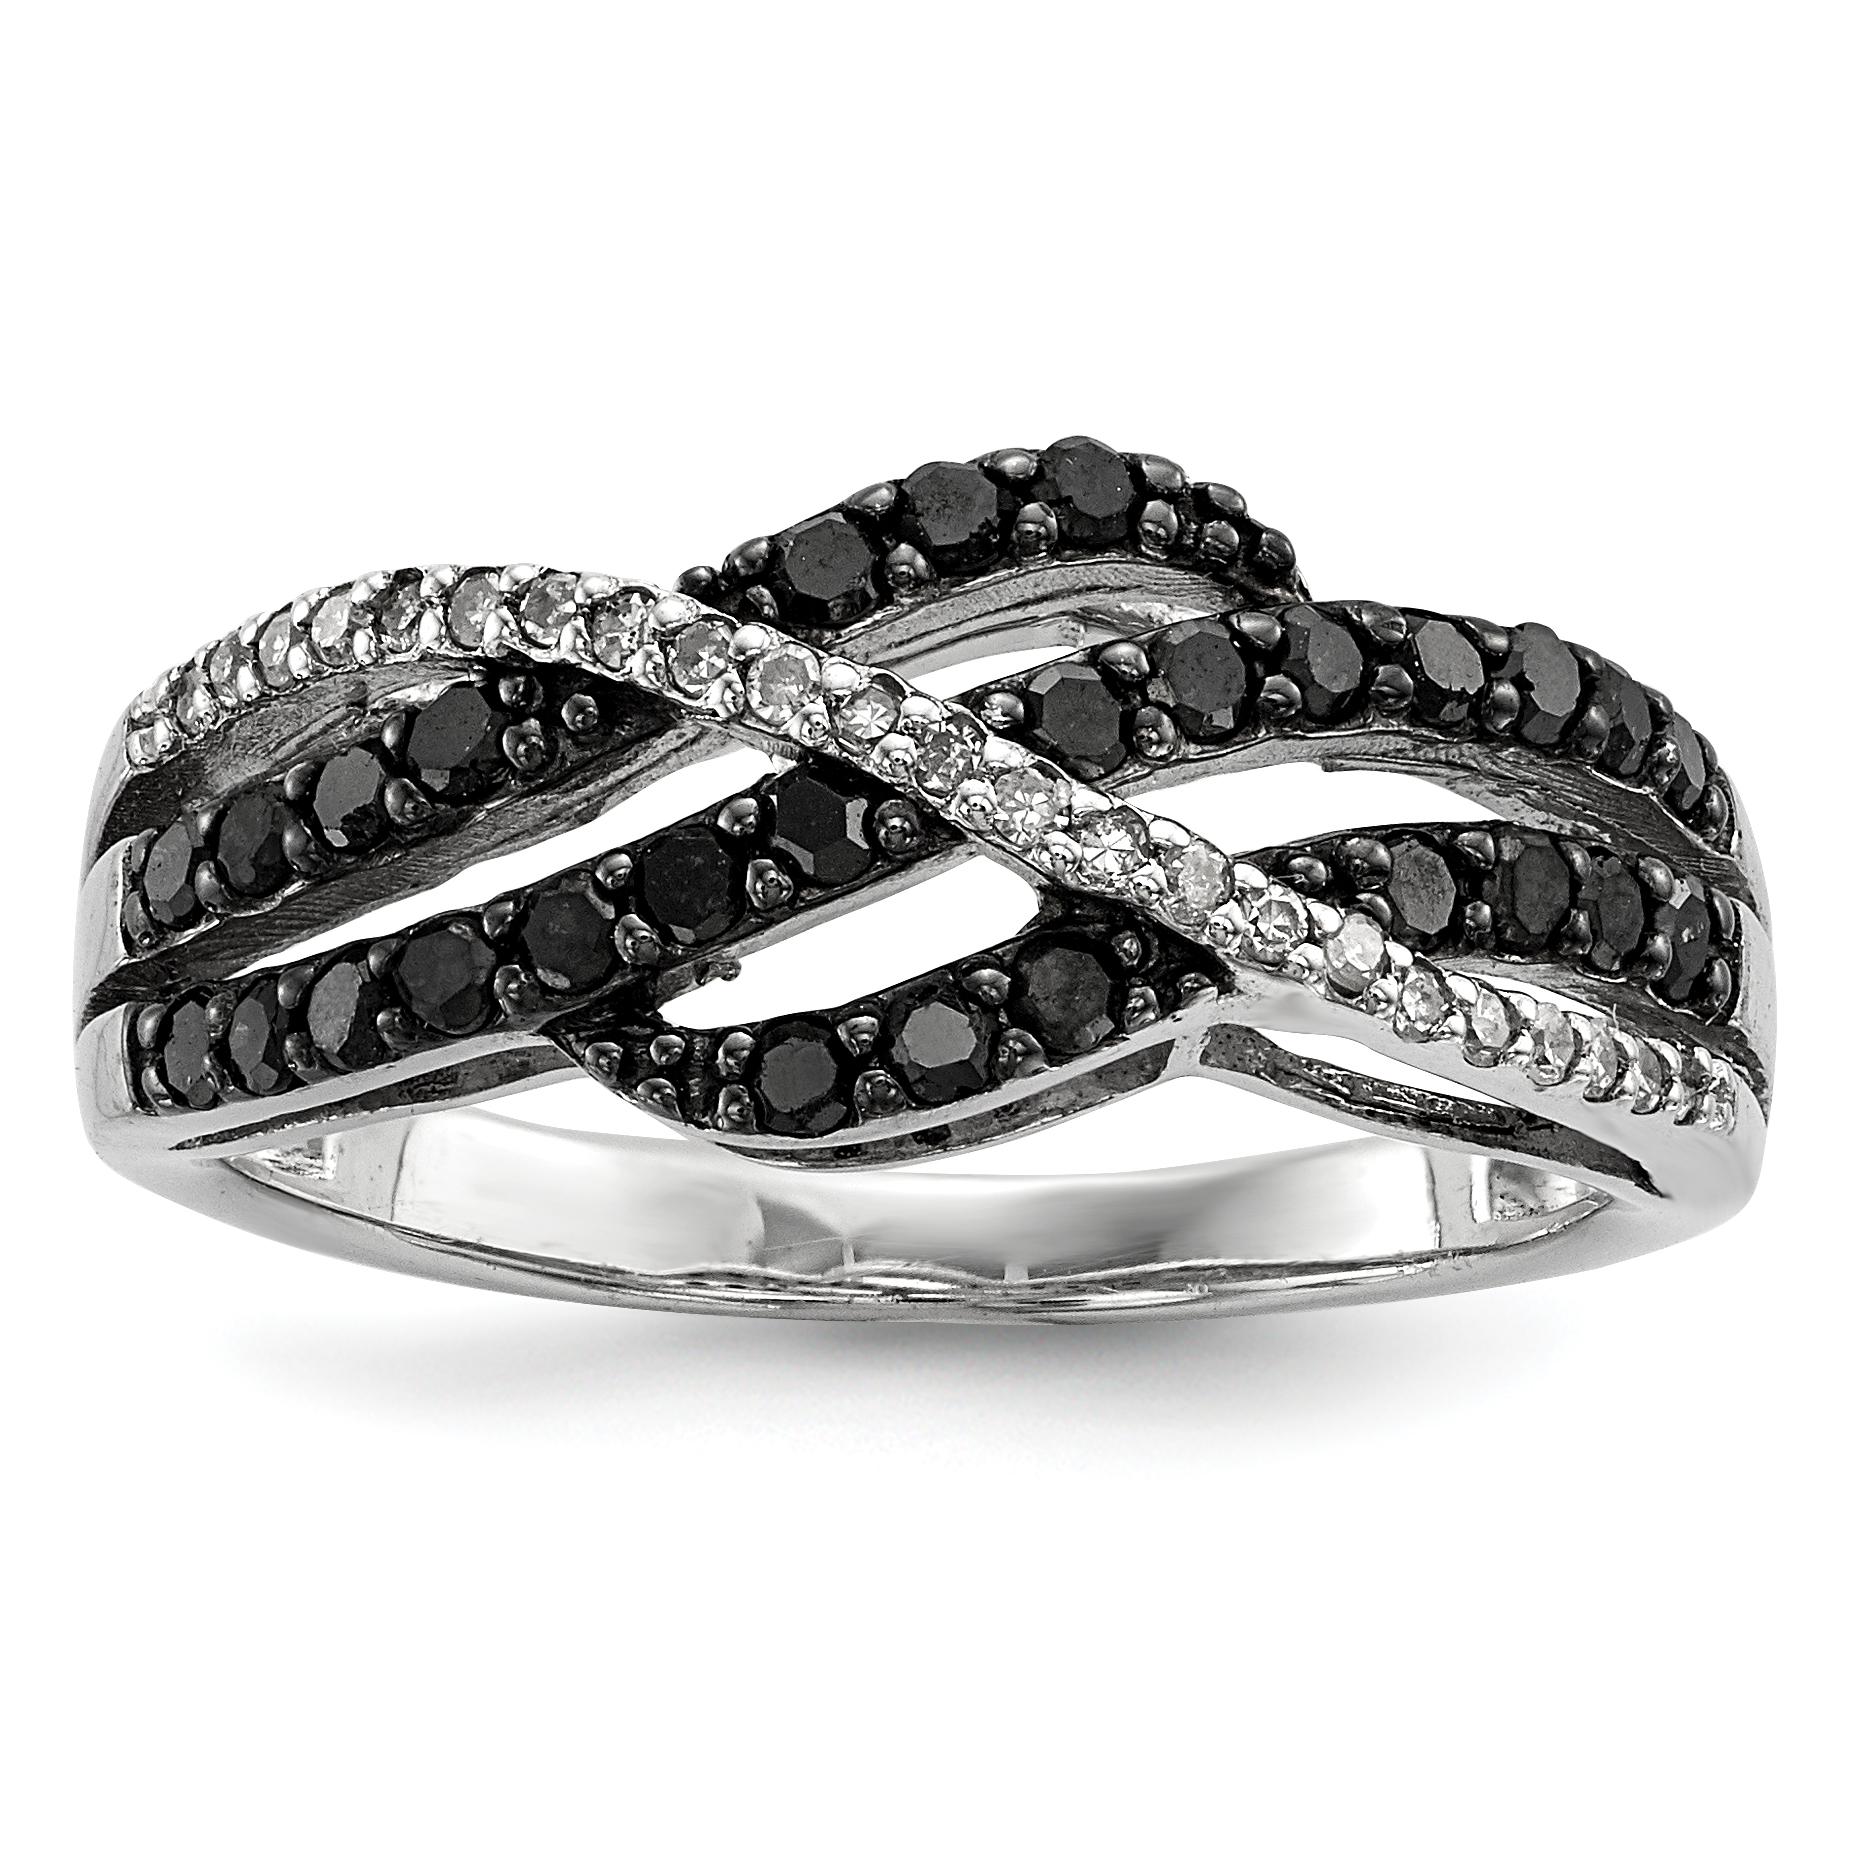 Sterling Silver Black & White Diamond Ring Size 8 - image 1 de 3